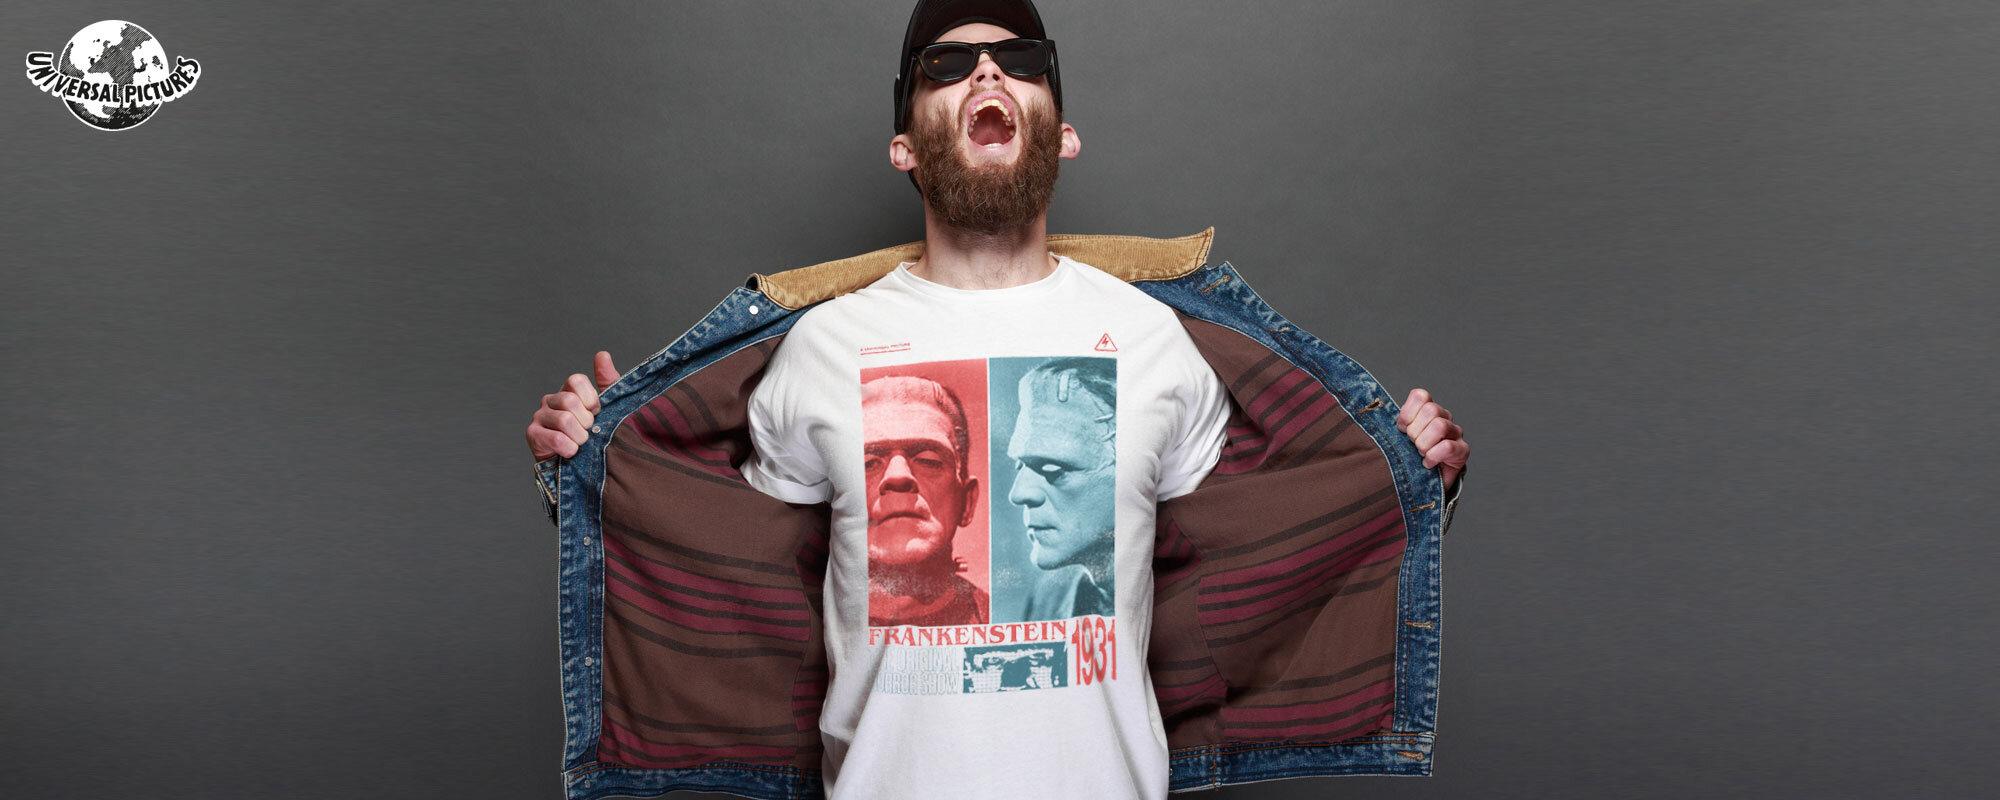 https://www.shirtstore.no/pub_docs/files/Startsida2021/2021-UniversalMonsters.jpg